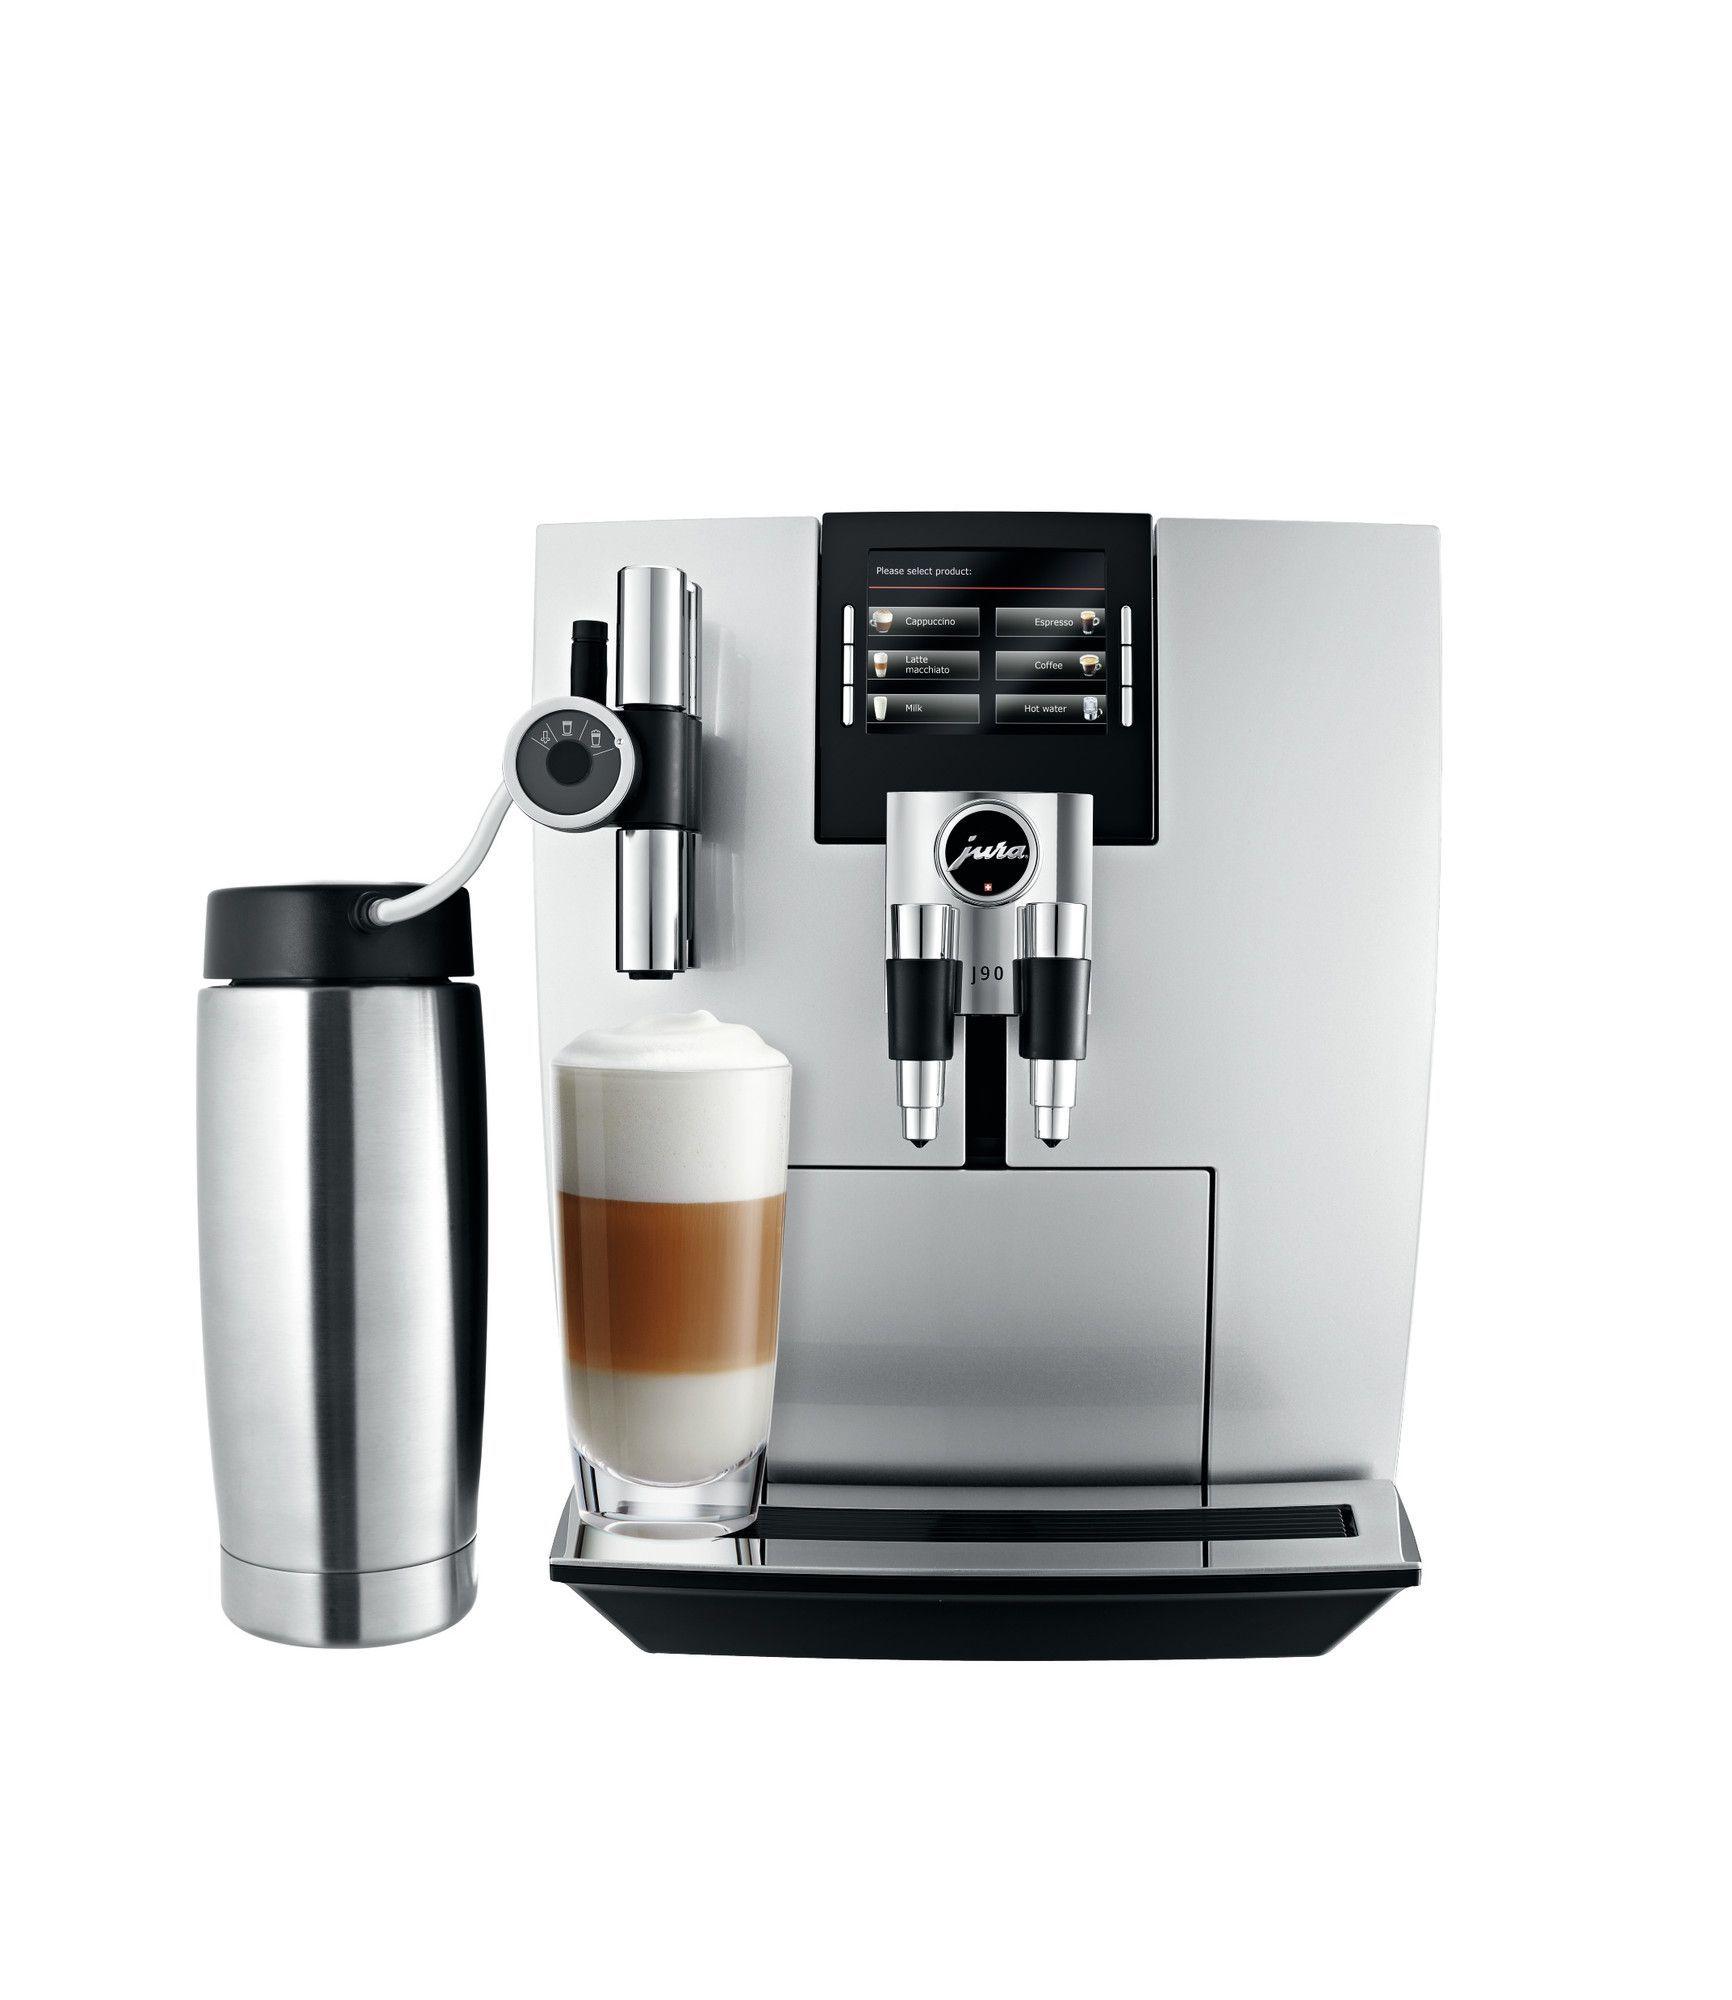 J90 One Touch TFT Espresso Machine Automatic coffee